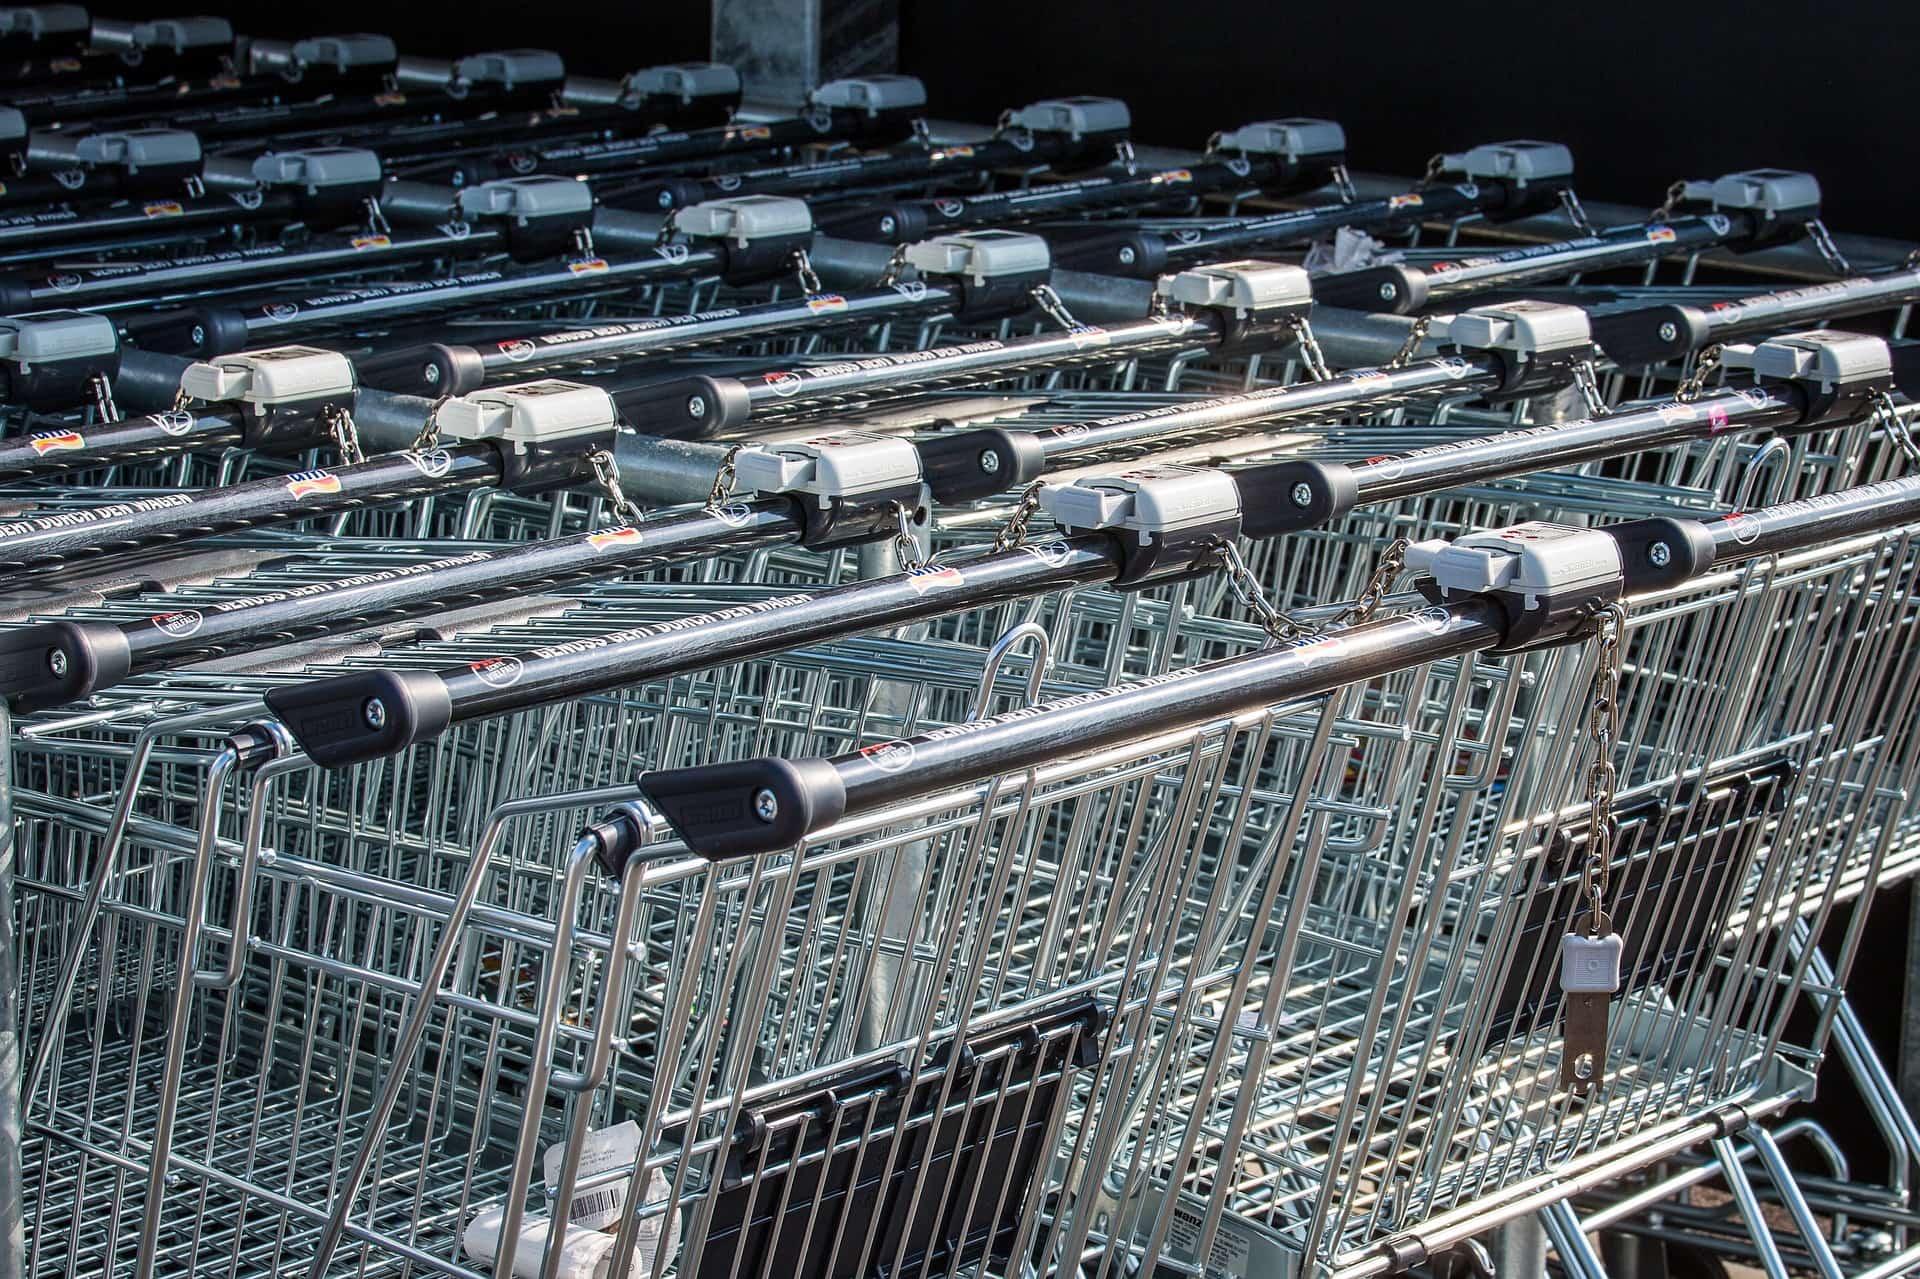 regulamin sklepu internetowego w USA